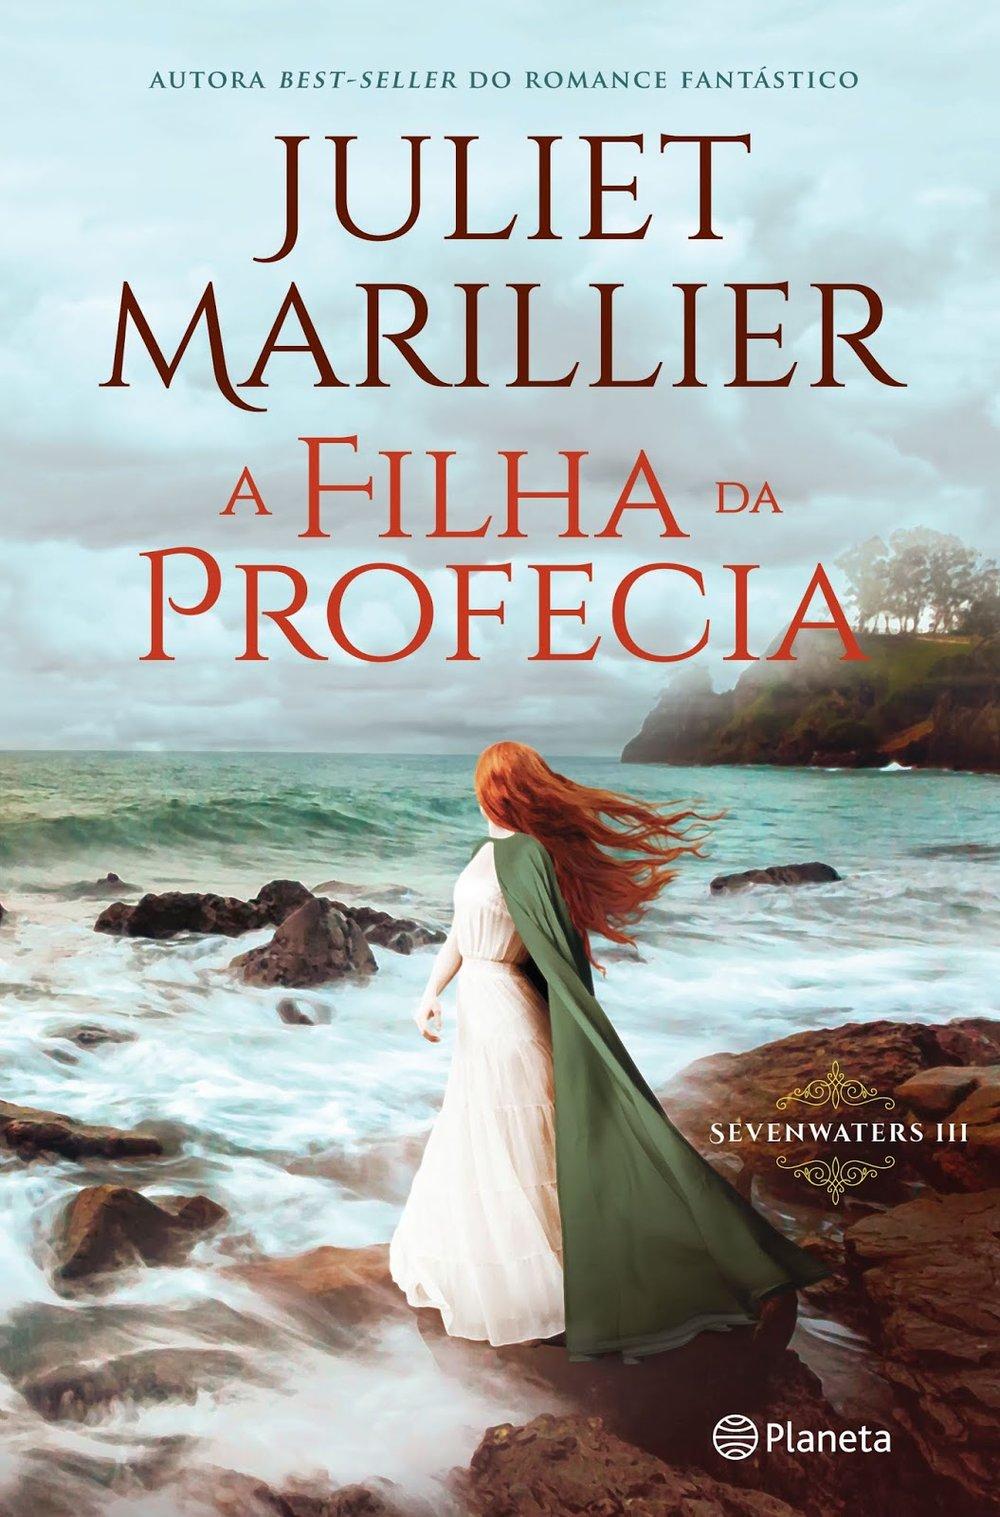 9789896579883 Filha_Profecia Juliet Marillier Capa em alta.jpg